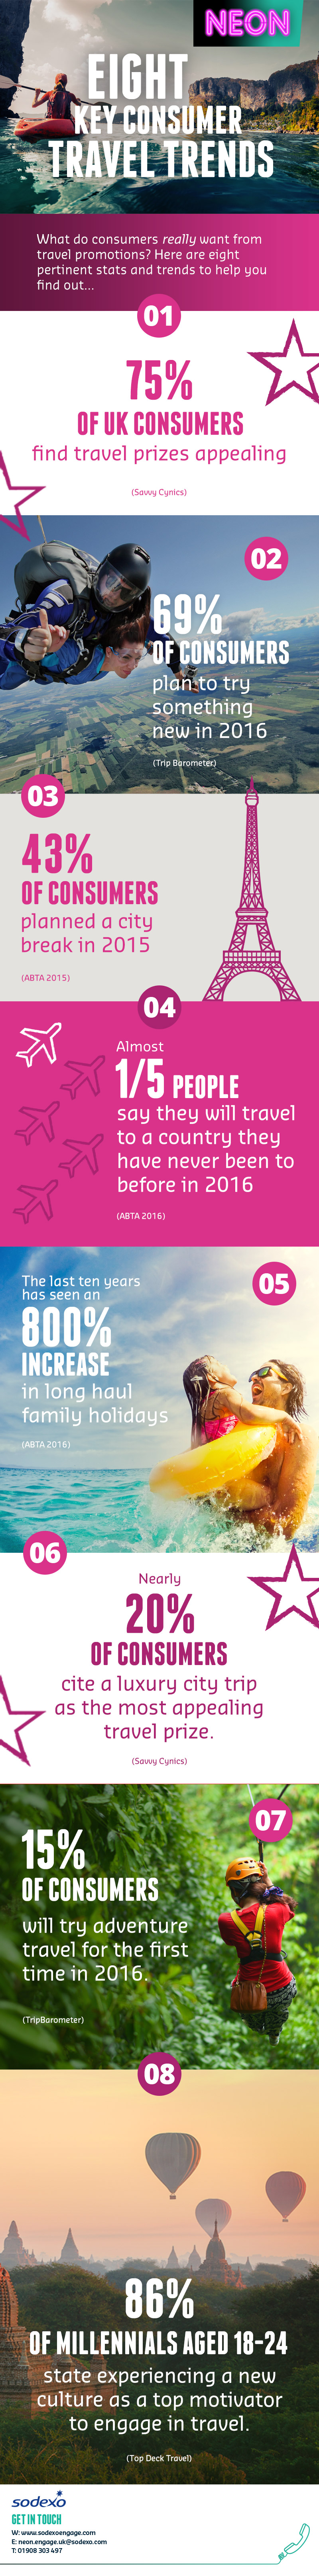 NEON-Eight-Key-Consumer-Travel-Trends.jpg